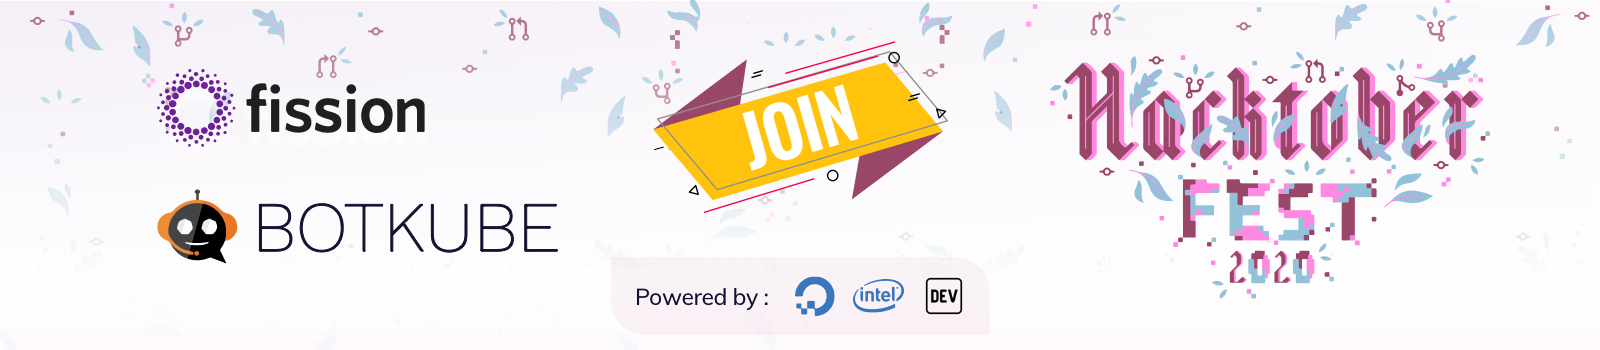 InfraCloud joins Hacktoberfest 2020